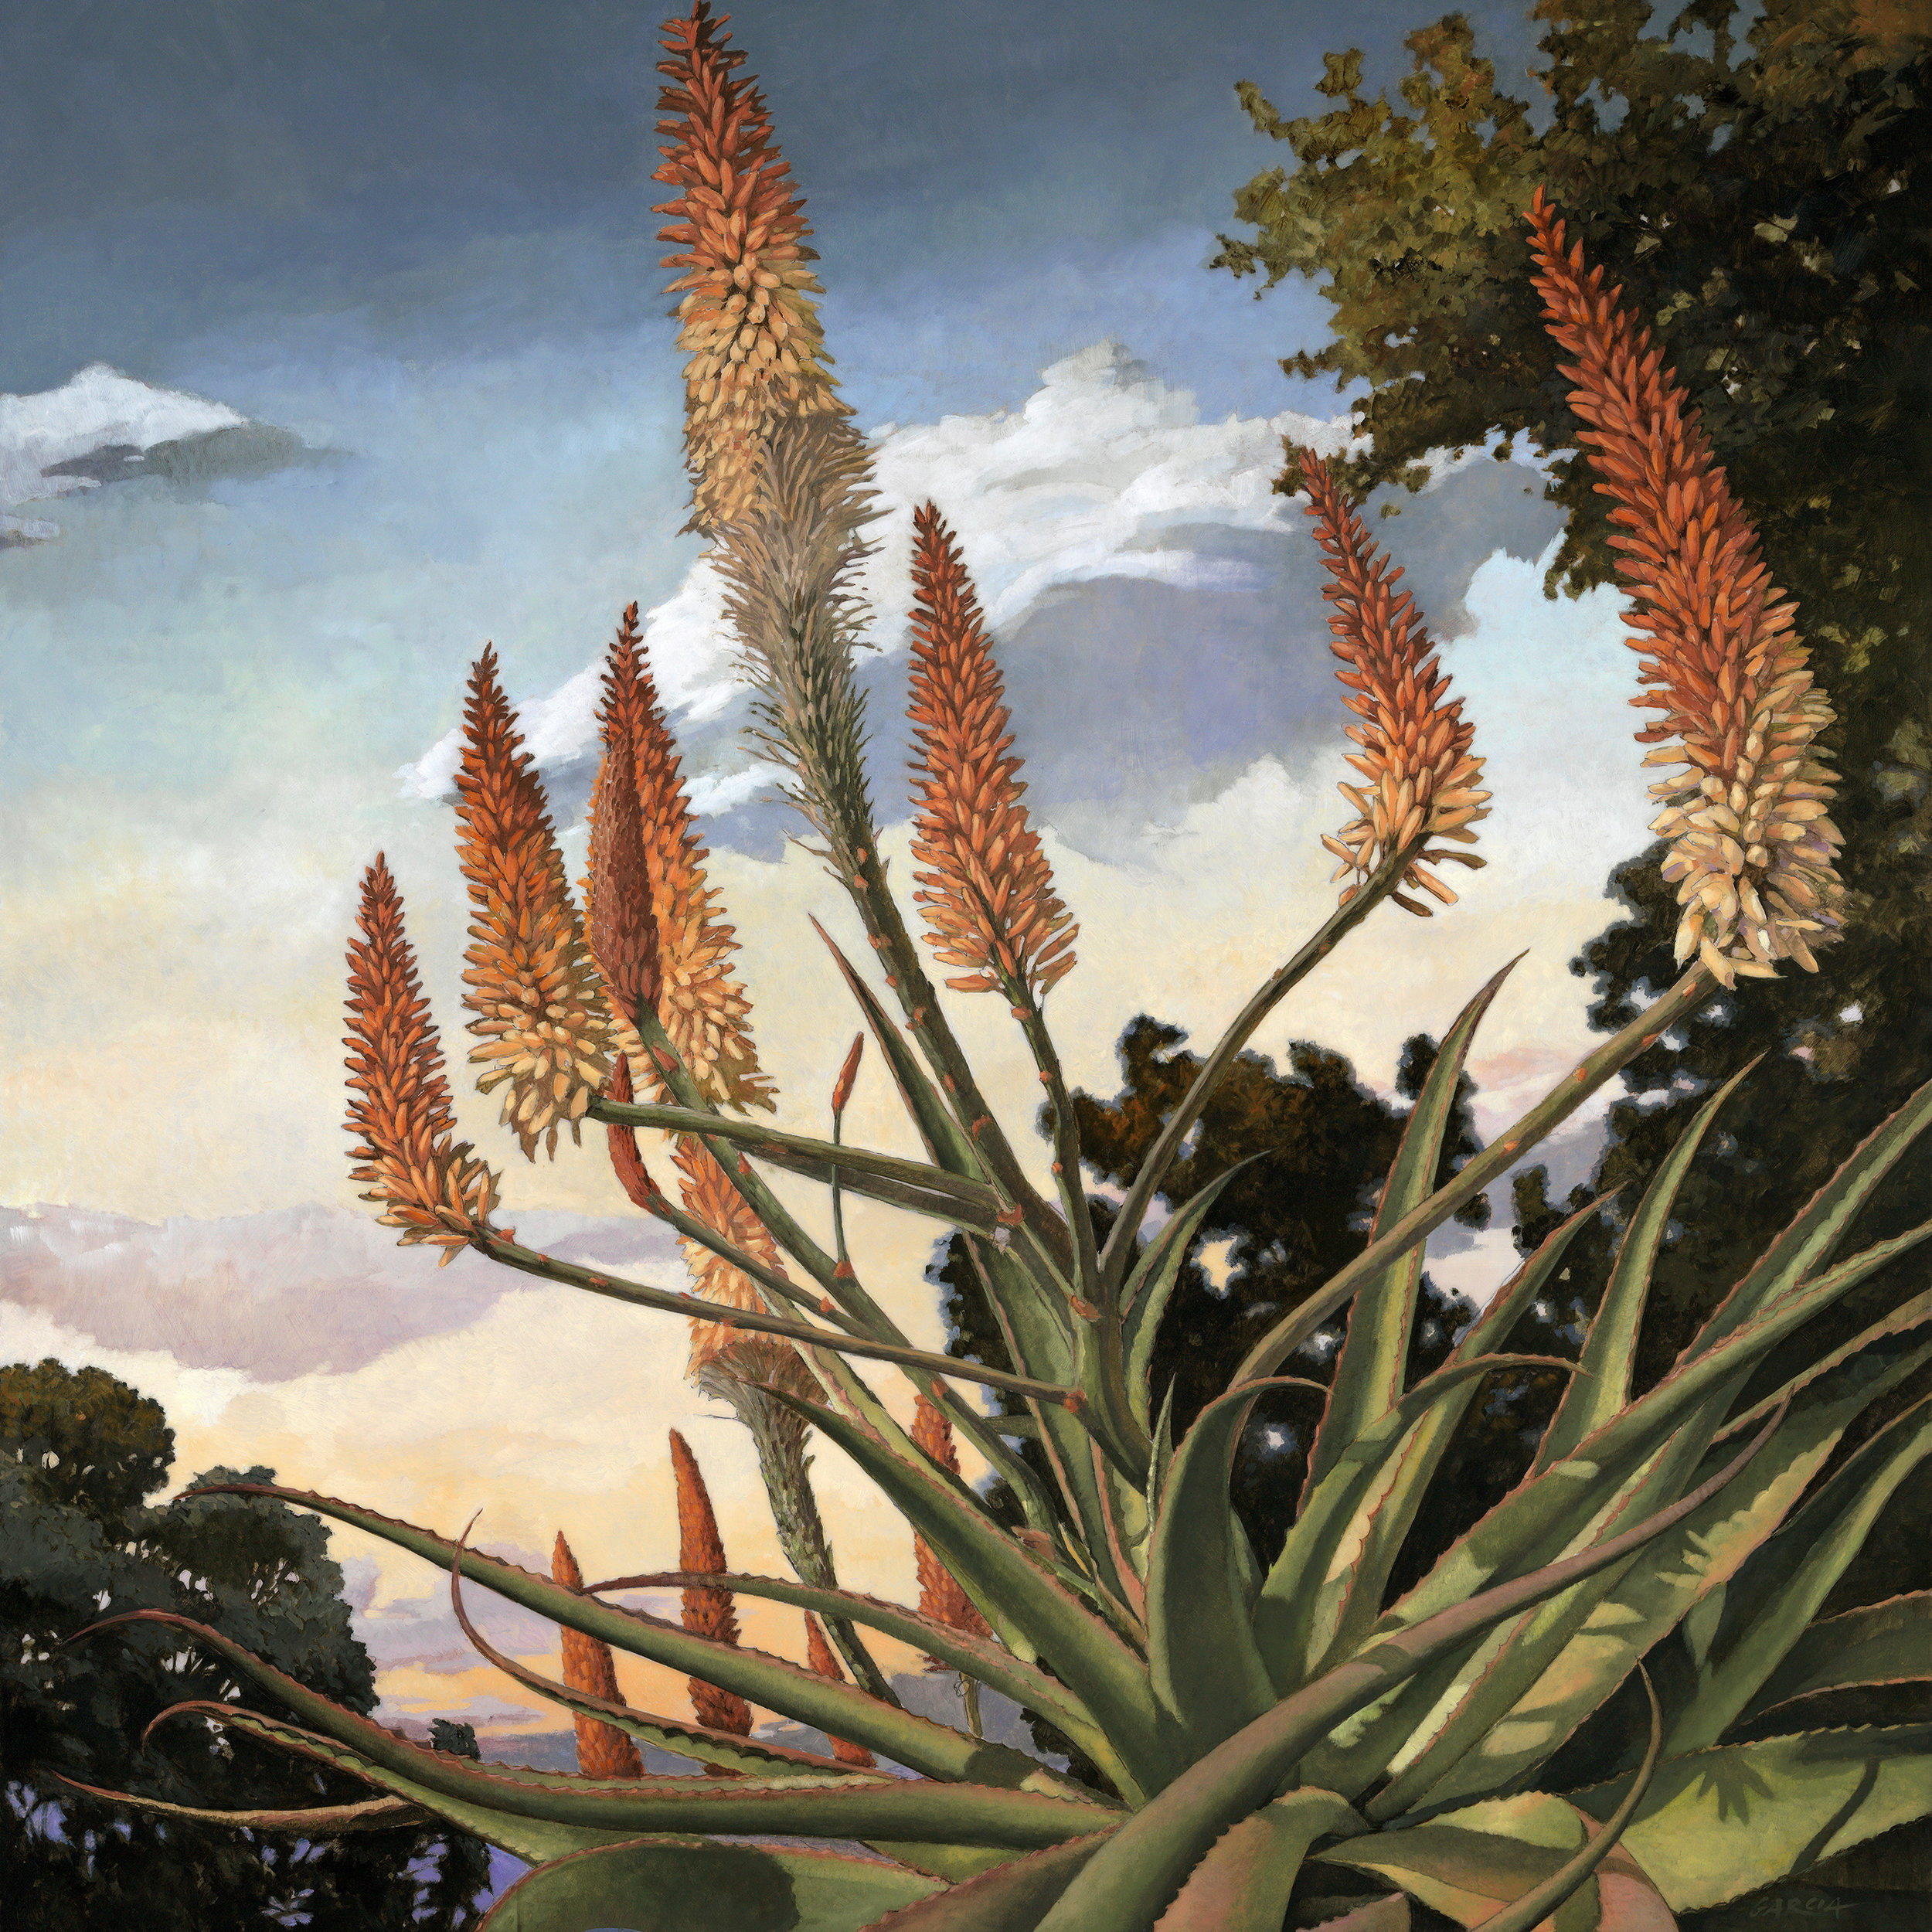 Aloe Tusker (comission) 36x36, at artist studio  SOLD